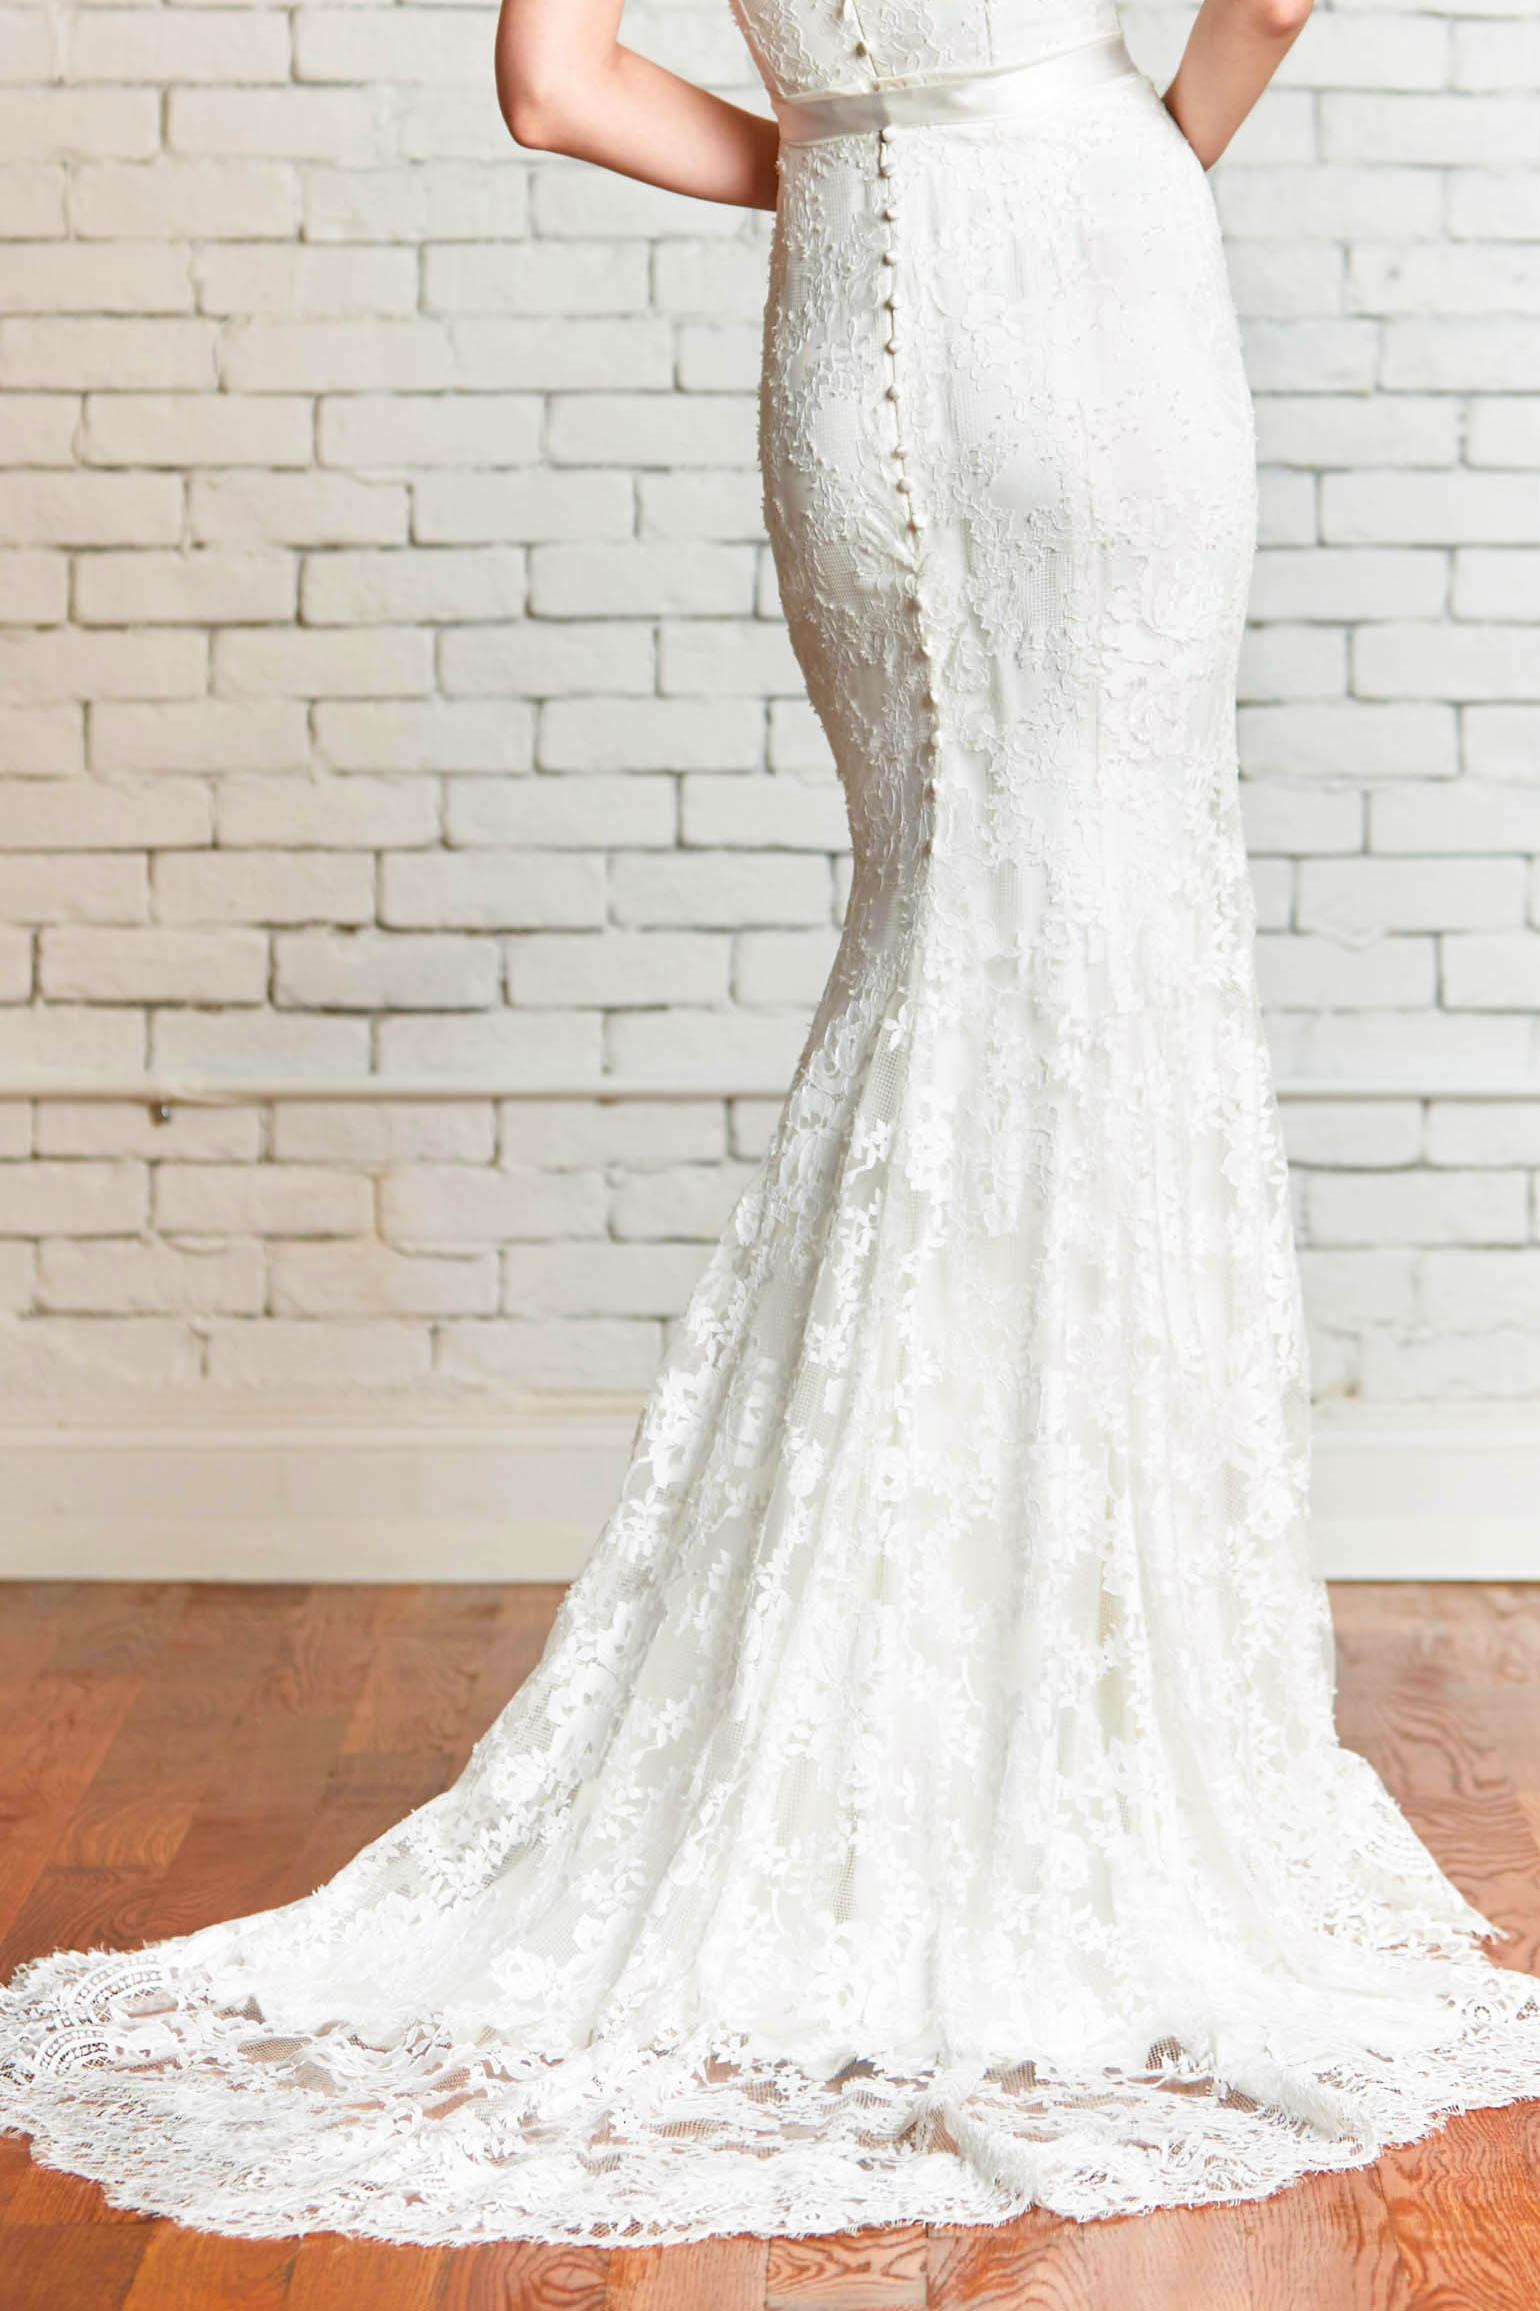 Hope_2back skirt_Mermaid_Lace_Skirt_Wedding_Separates.jpg